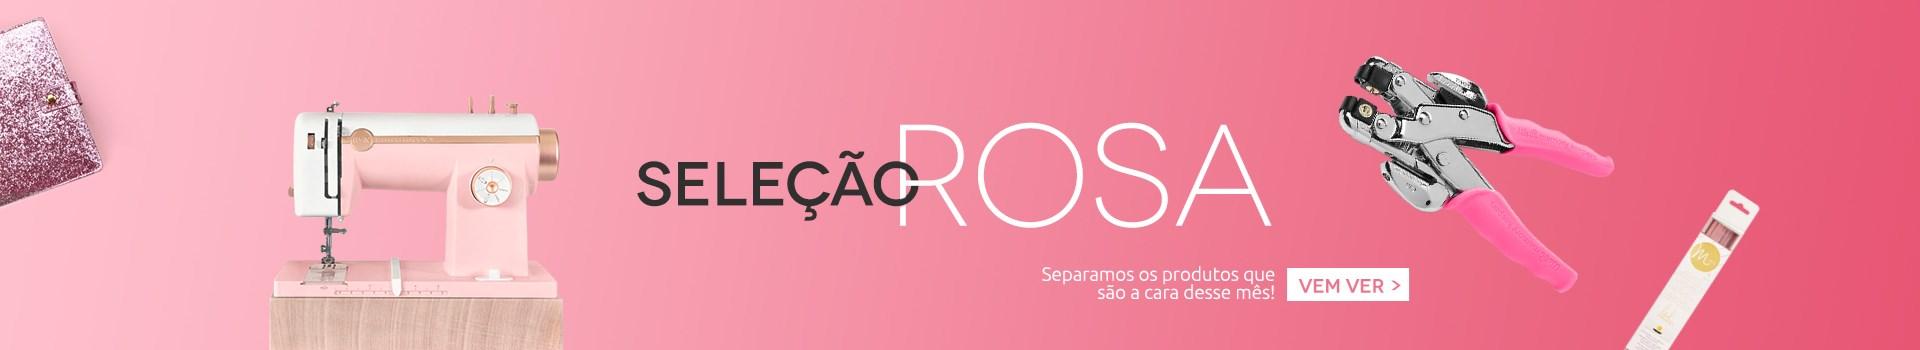 Invasão Rosa